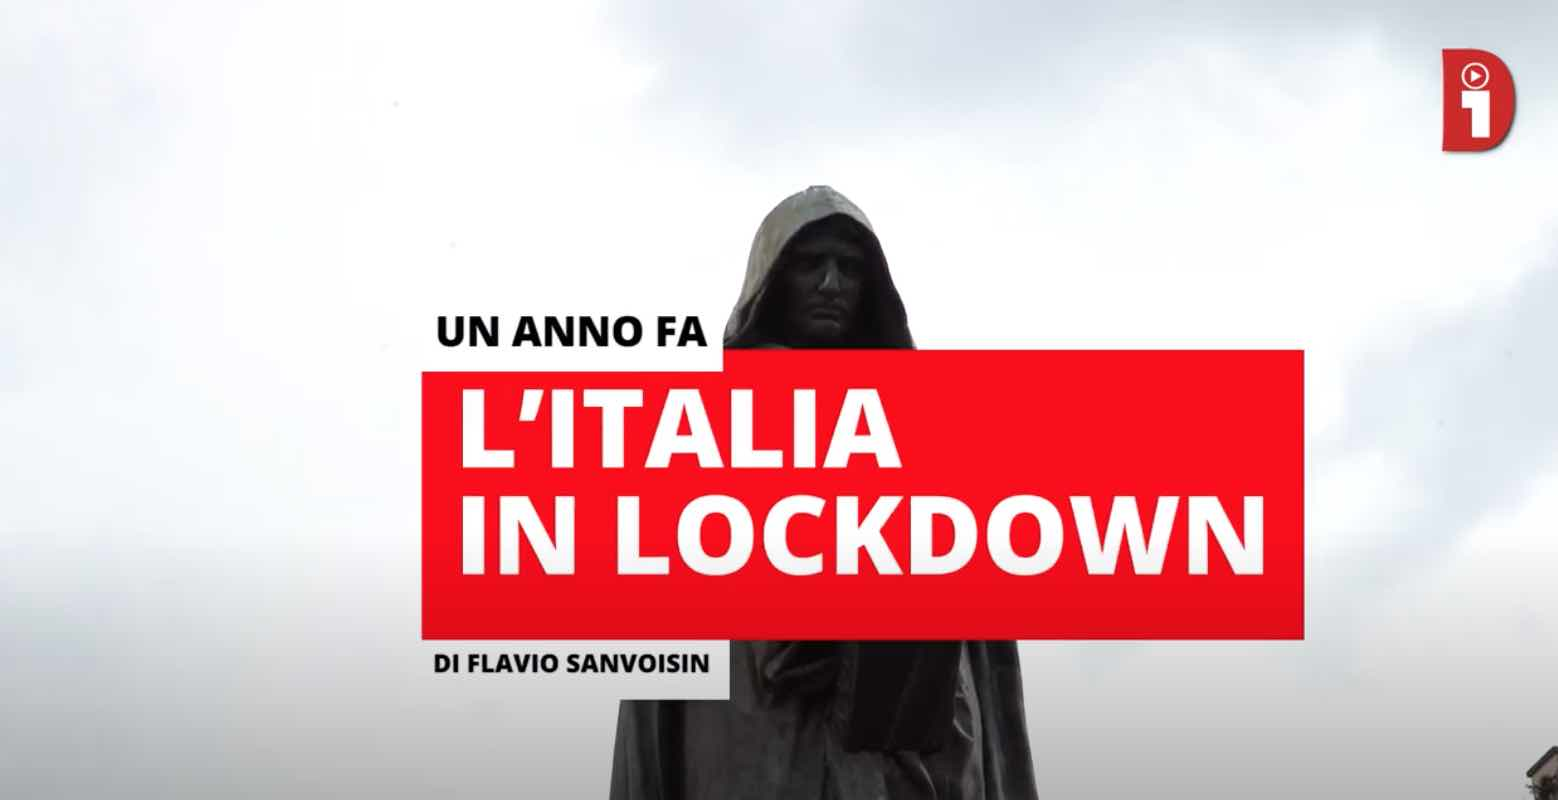 copertina italia lockdown